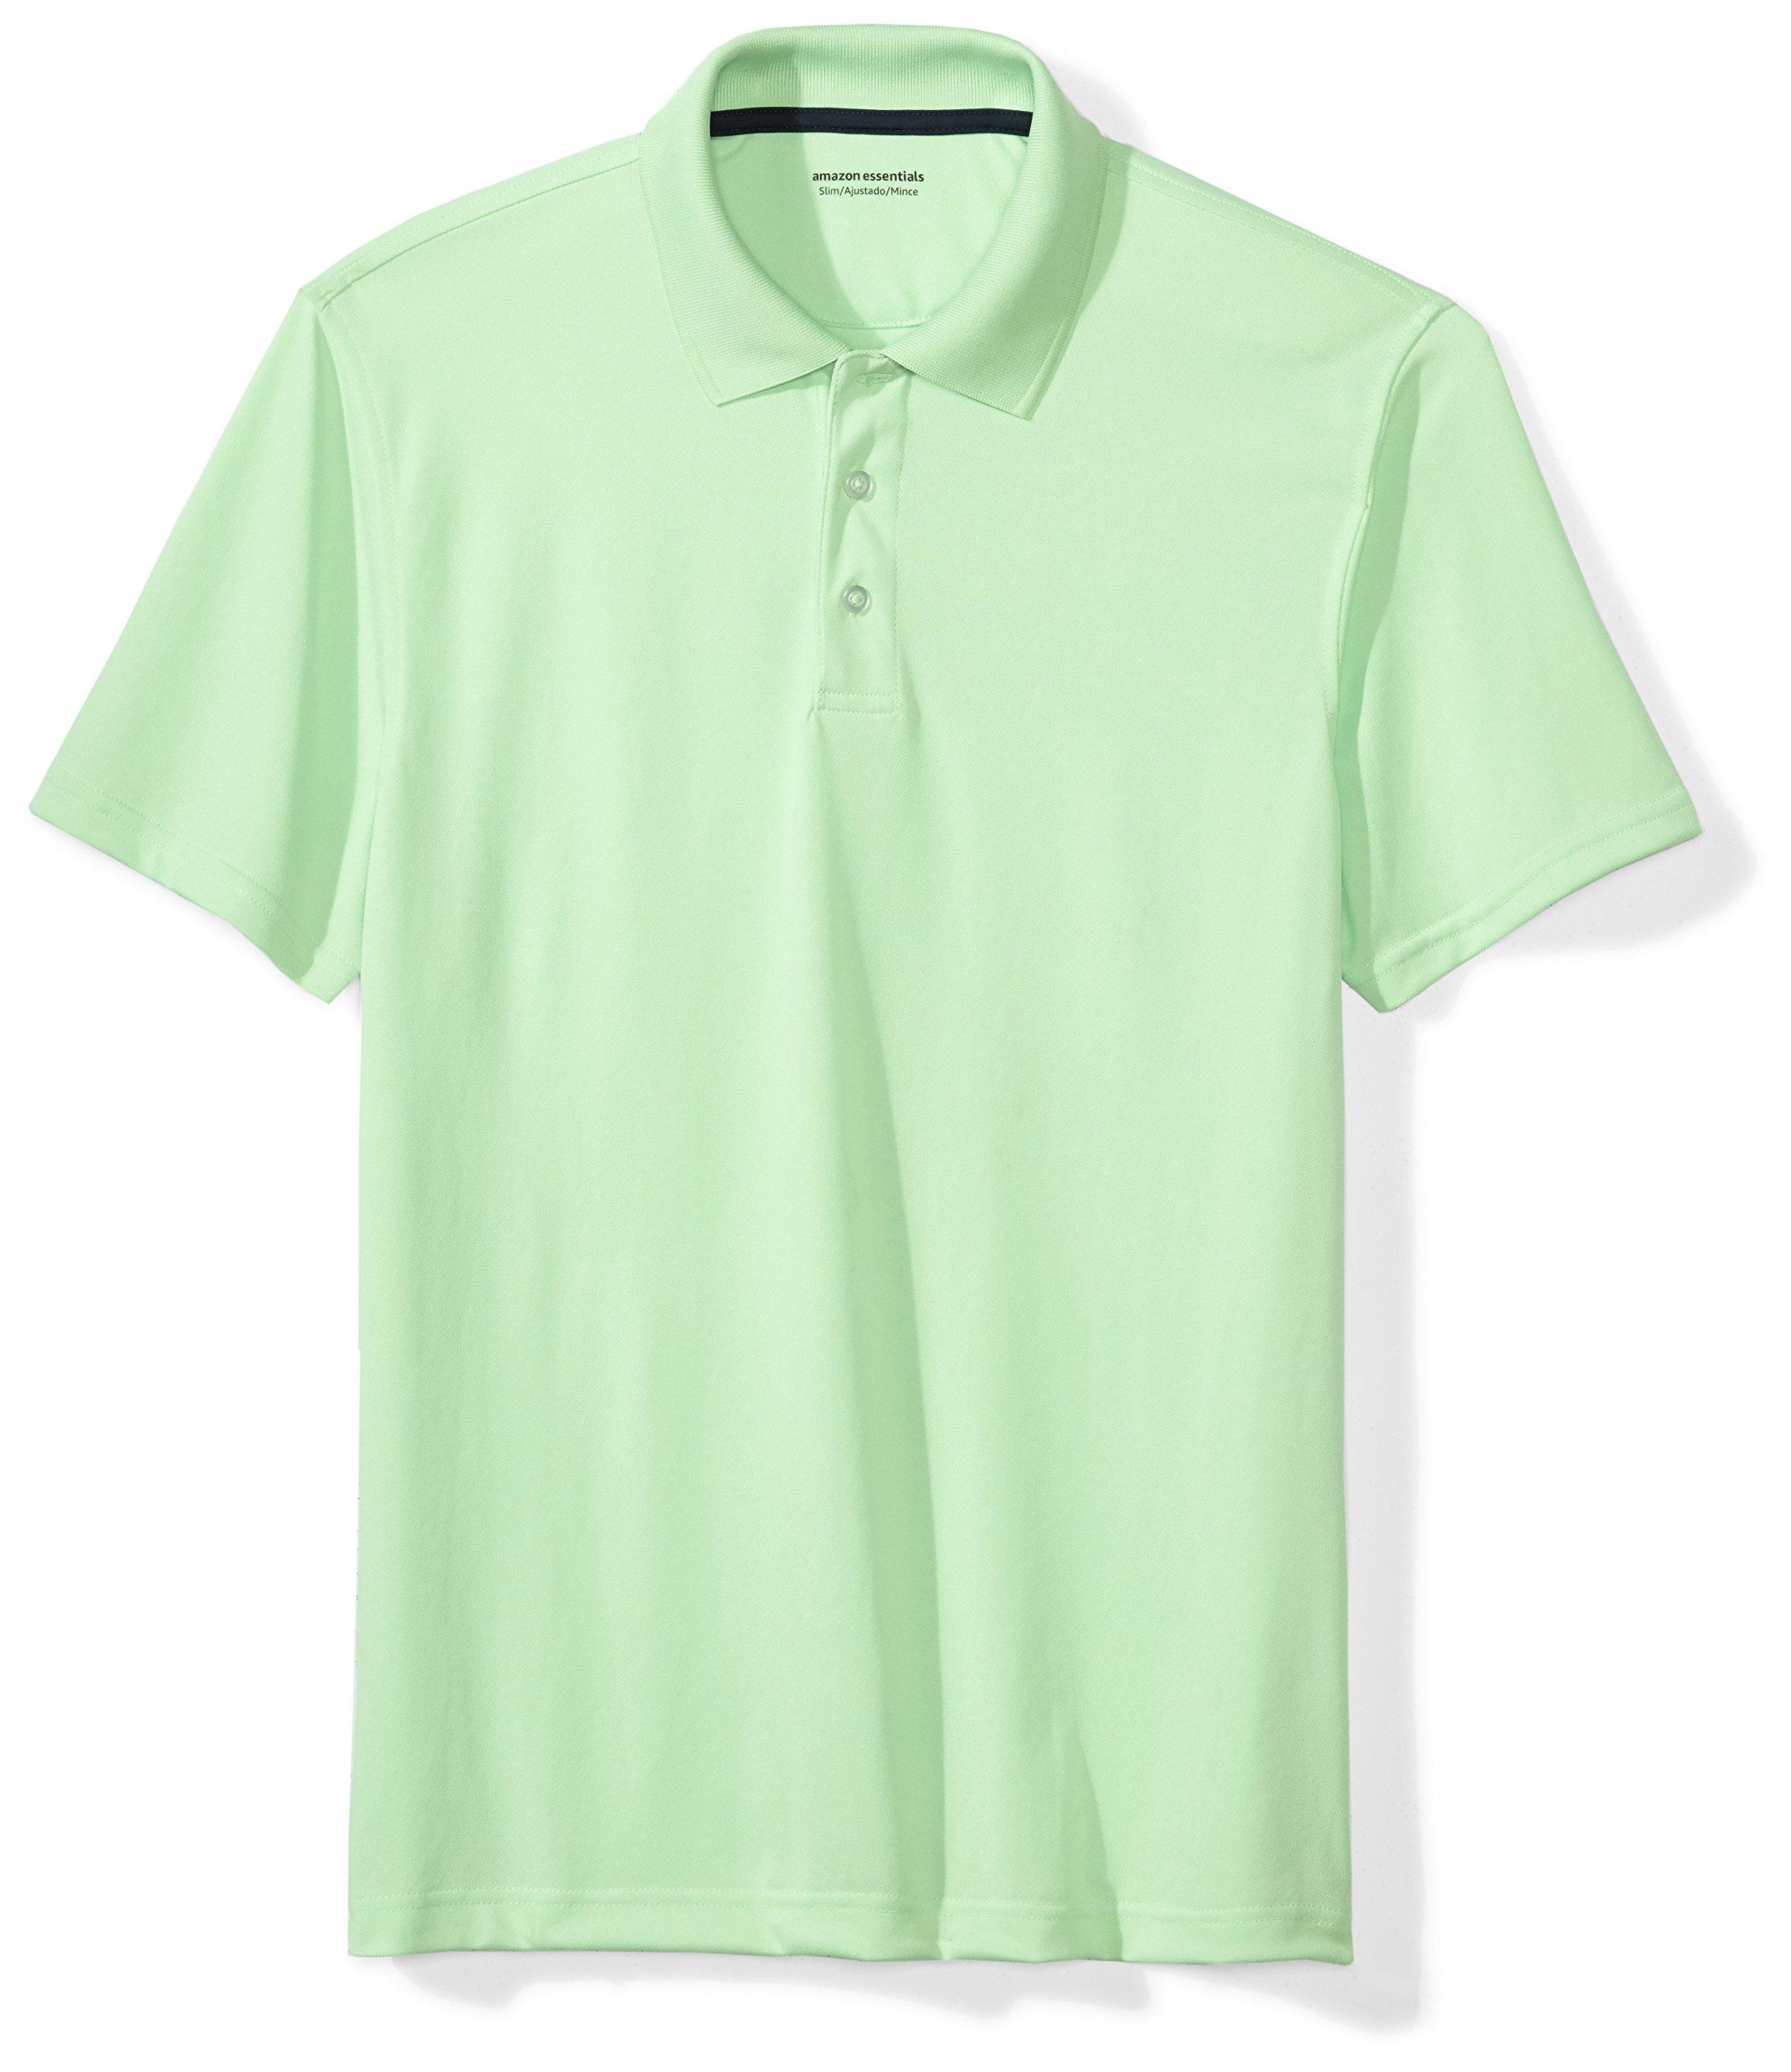 Amazon Essentials Men's Slim-Fit Quick-Dry Golf Polo Shirt, Lime Green, Medium by Amazon Essentials